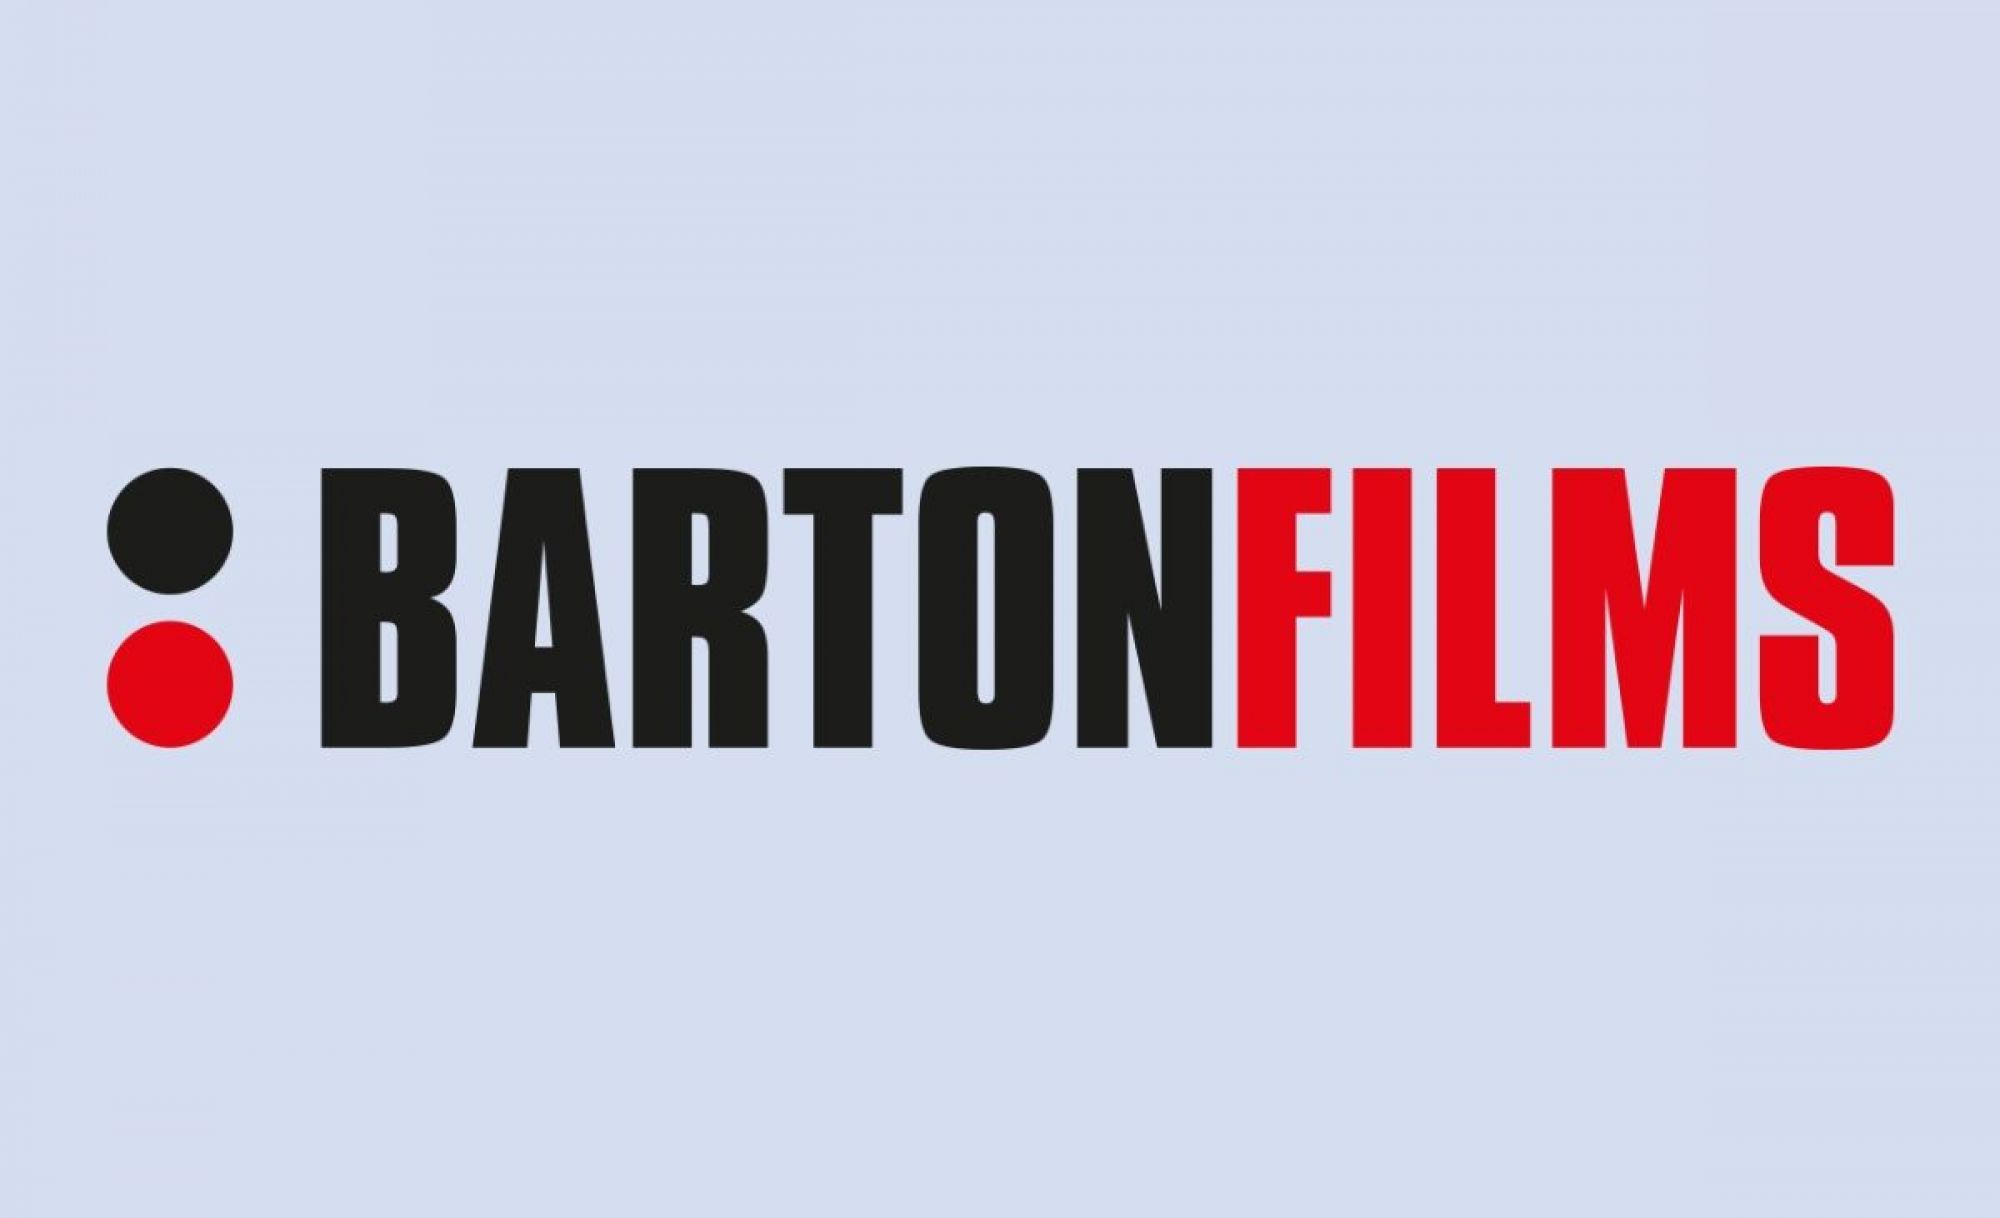 Barton_Films